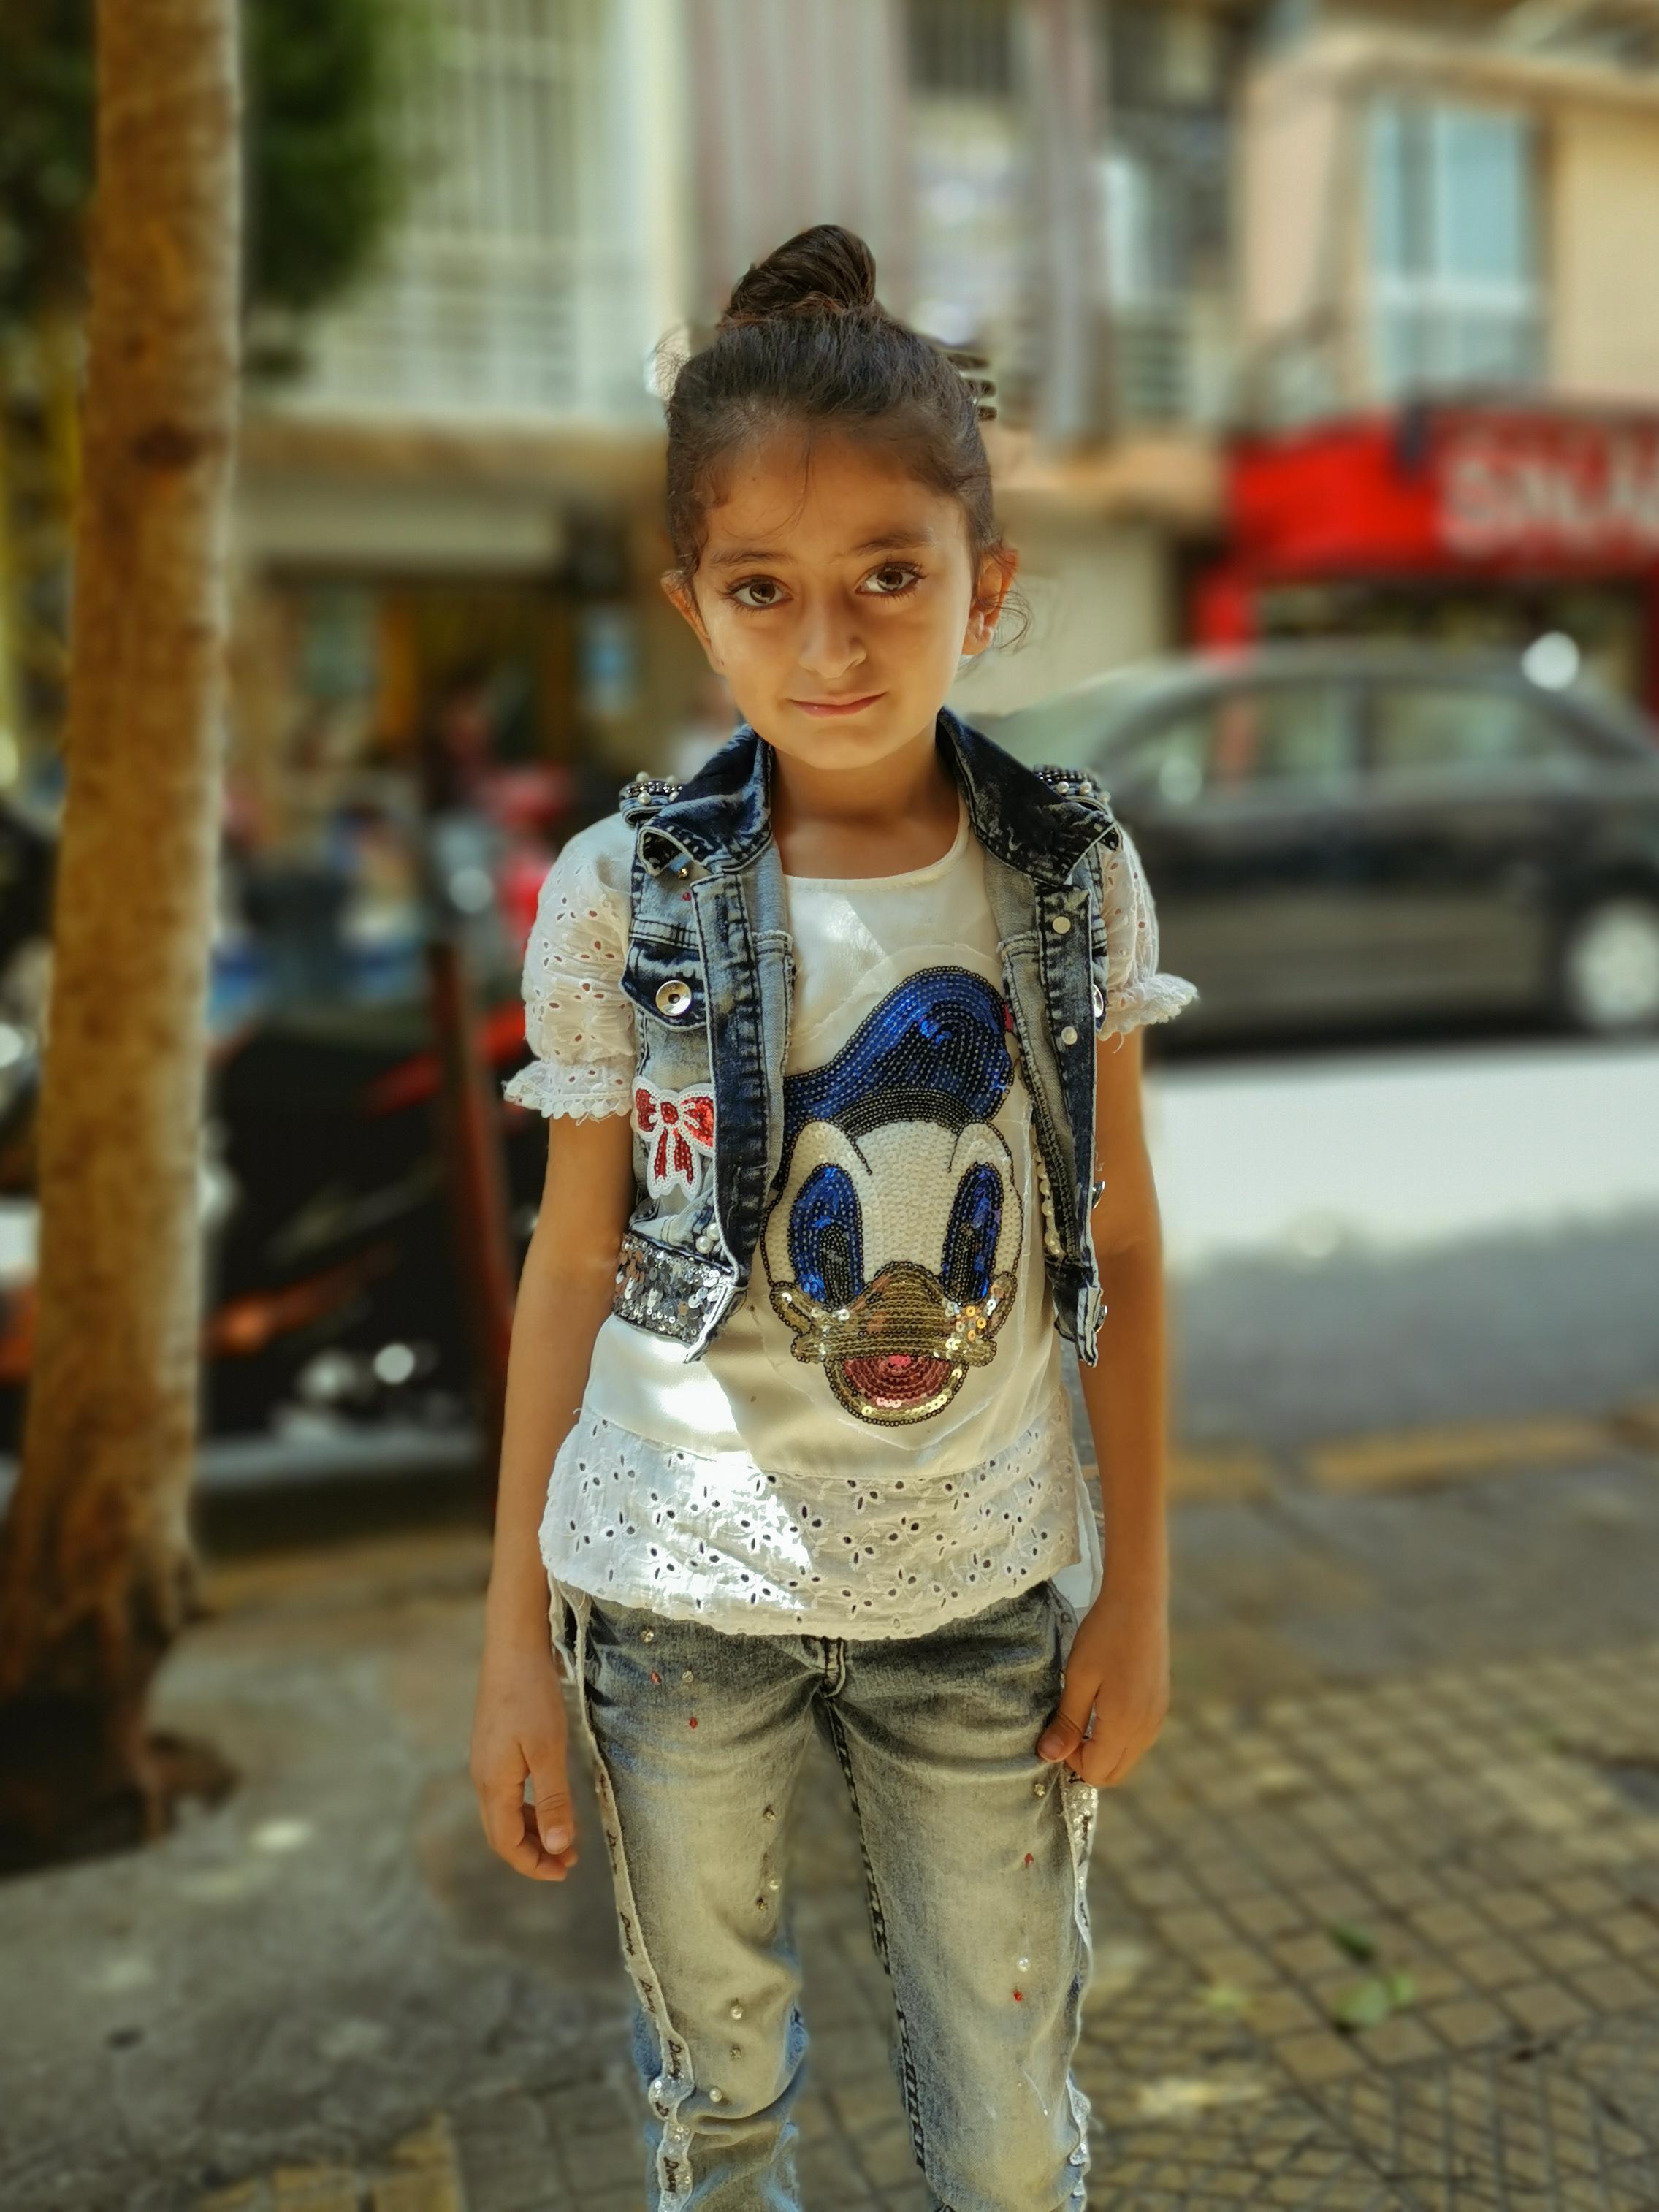 Nawal INARA Amanda Seyfried Arwa Damon Thomas Sadoski Syrian Refugees